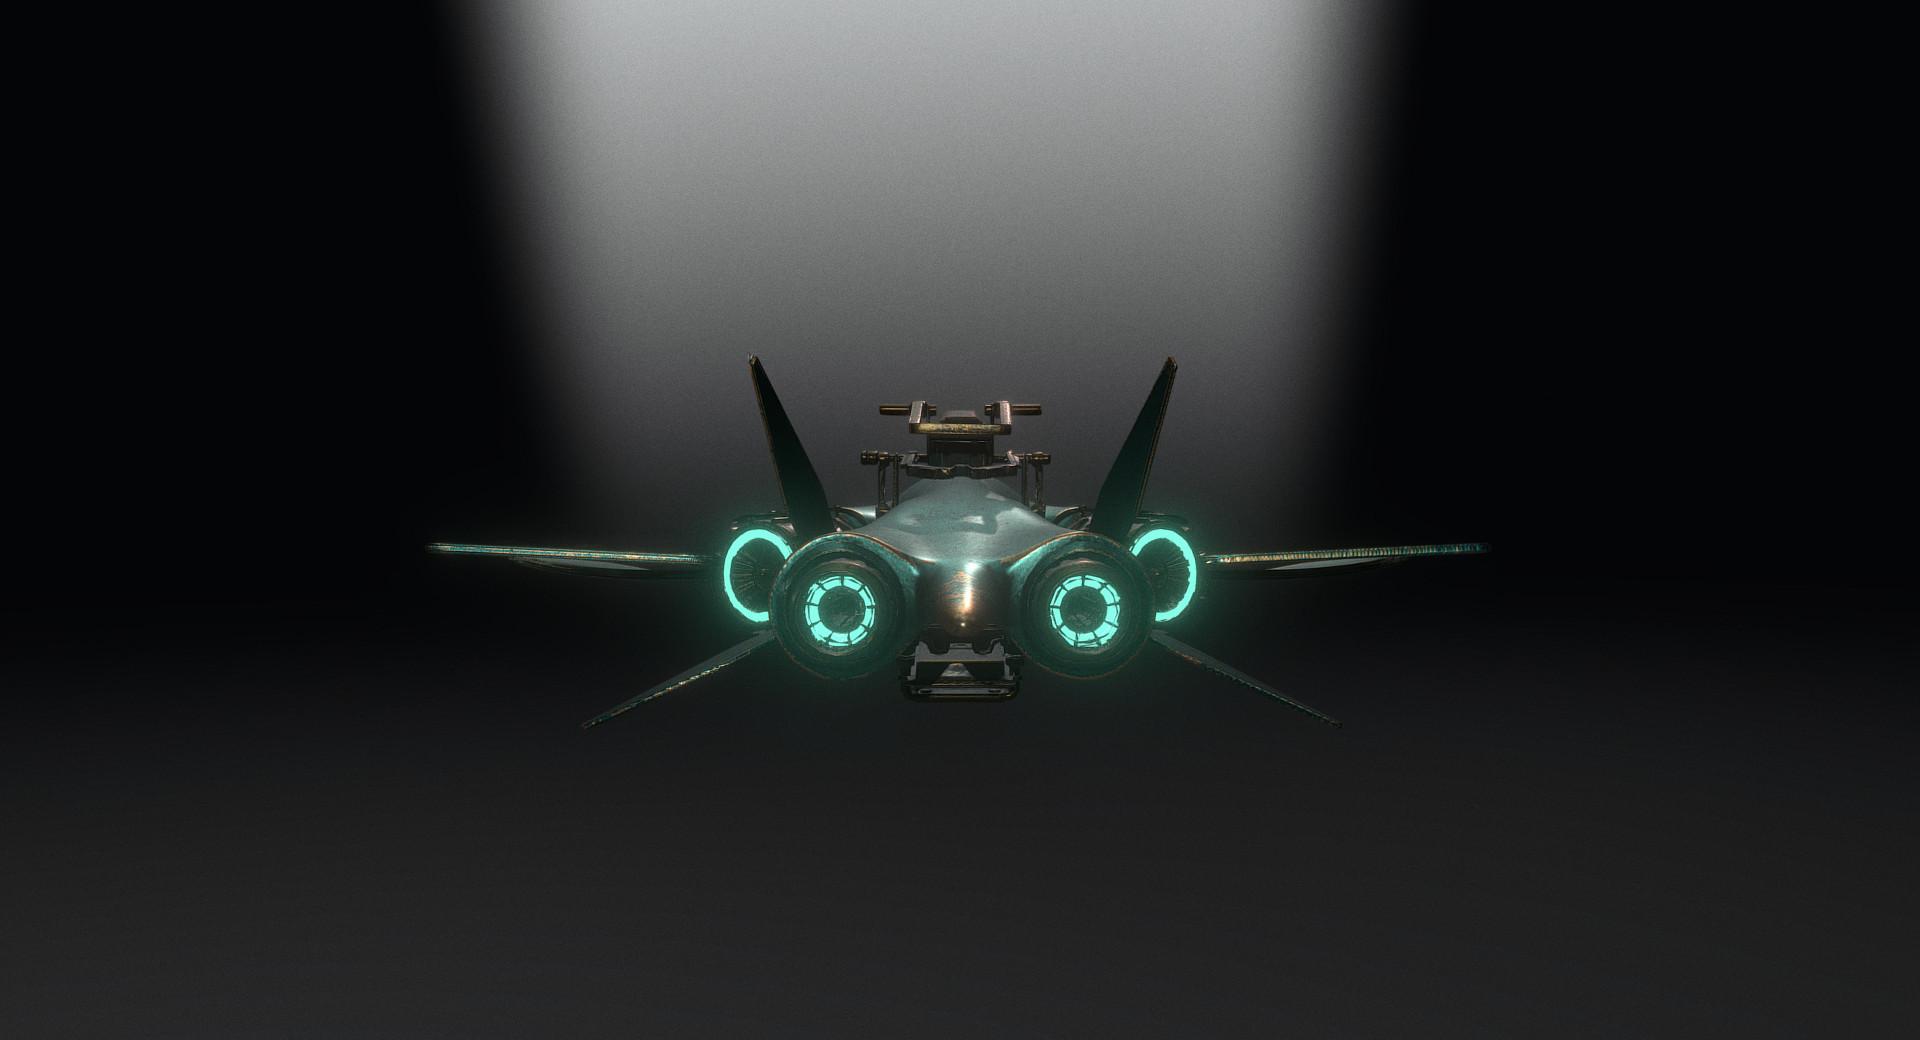 Asyrx mohd nor jet 1 back